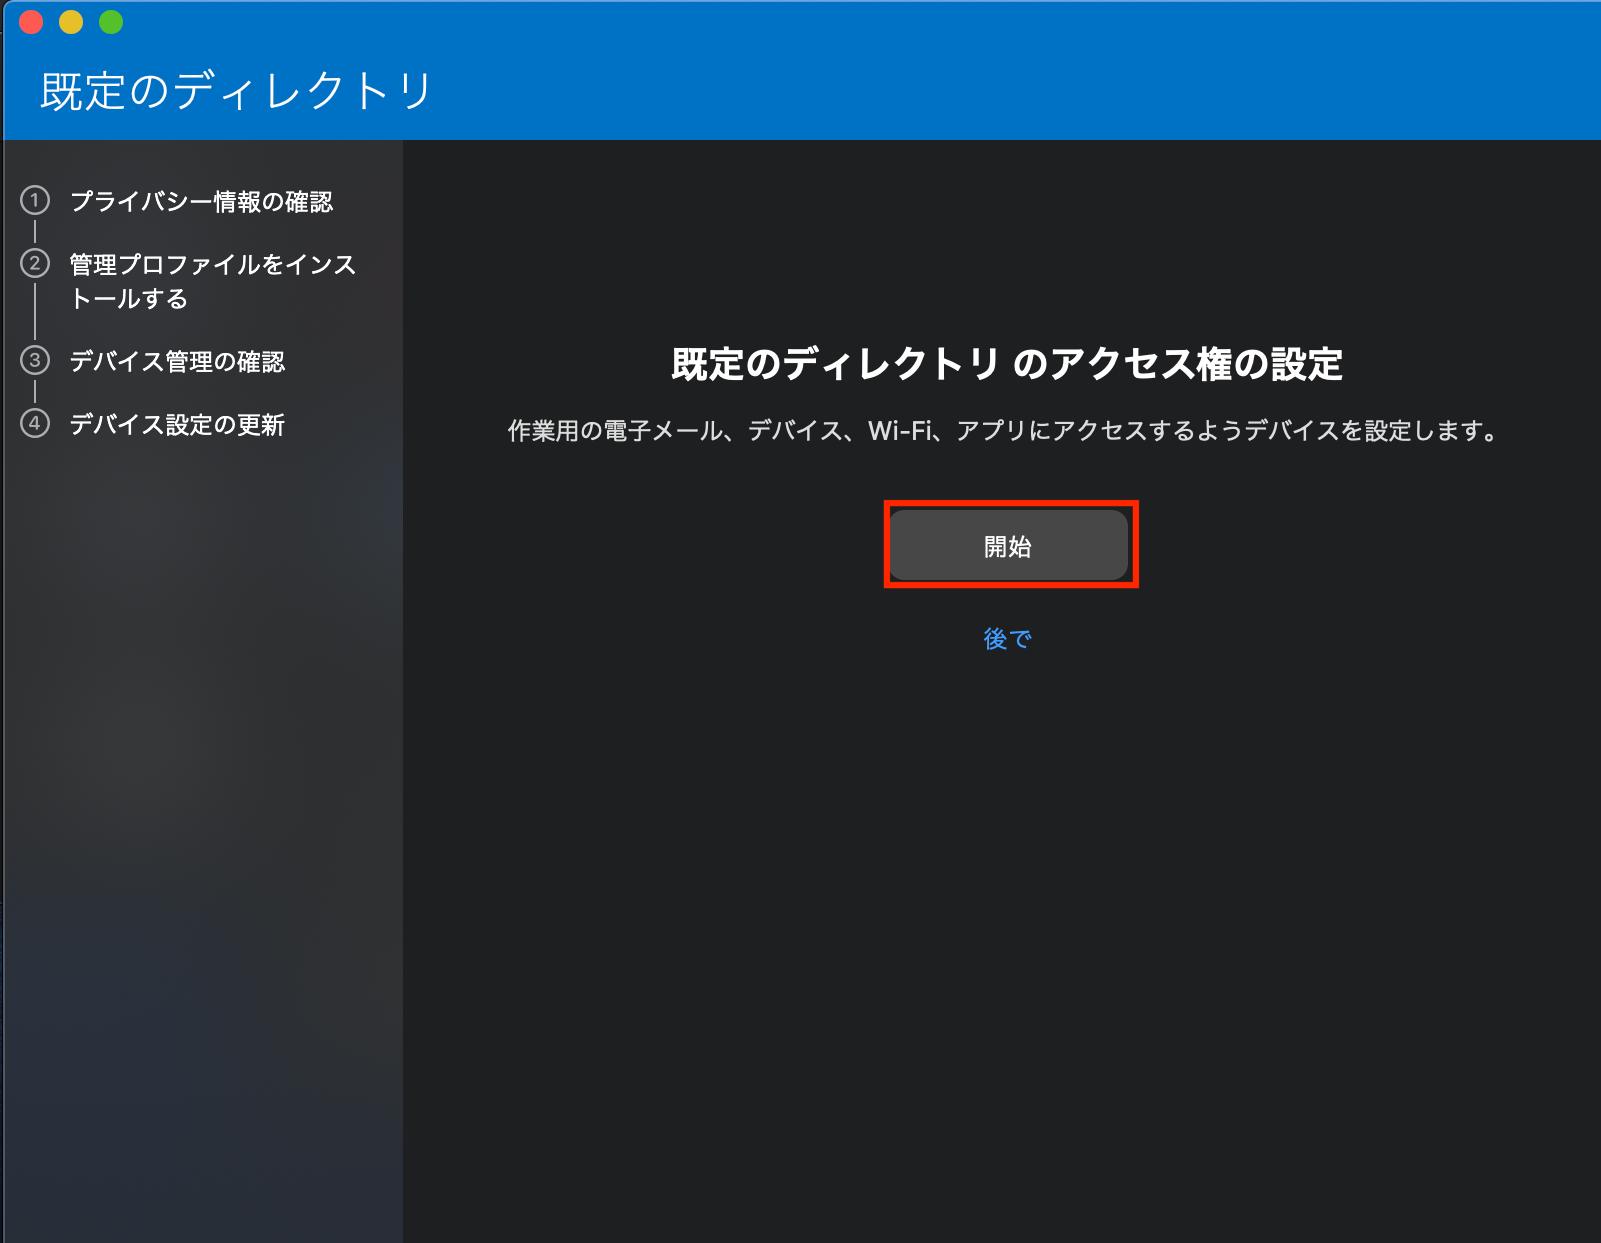 portal_site_5.png